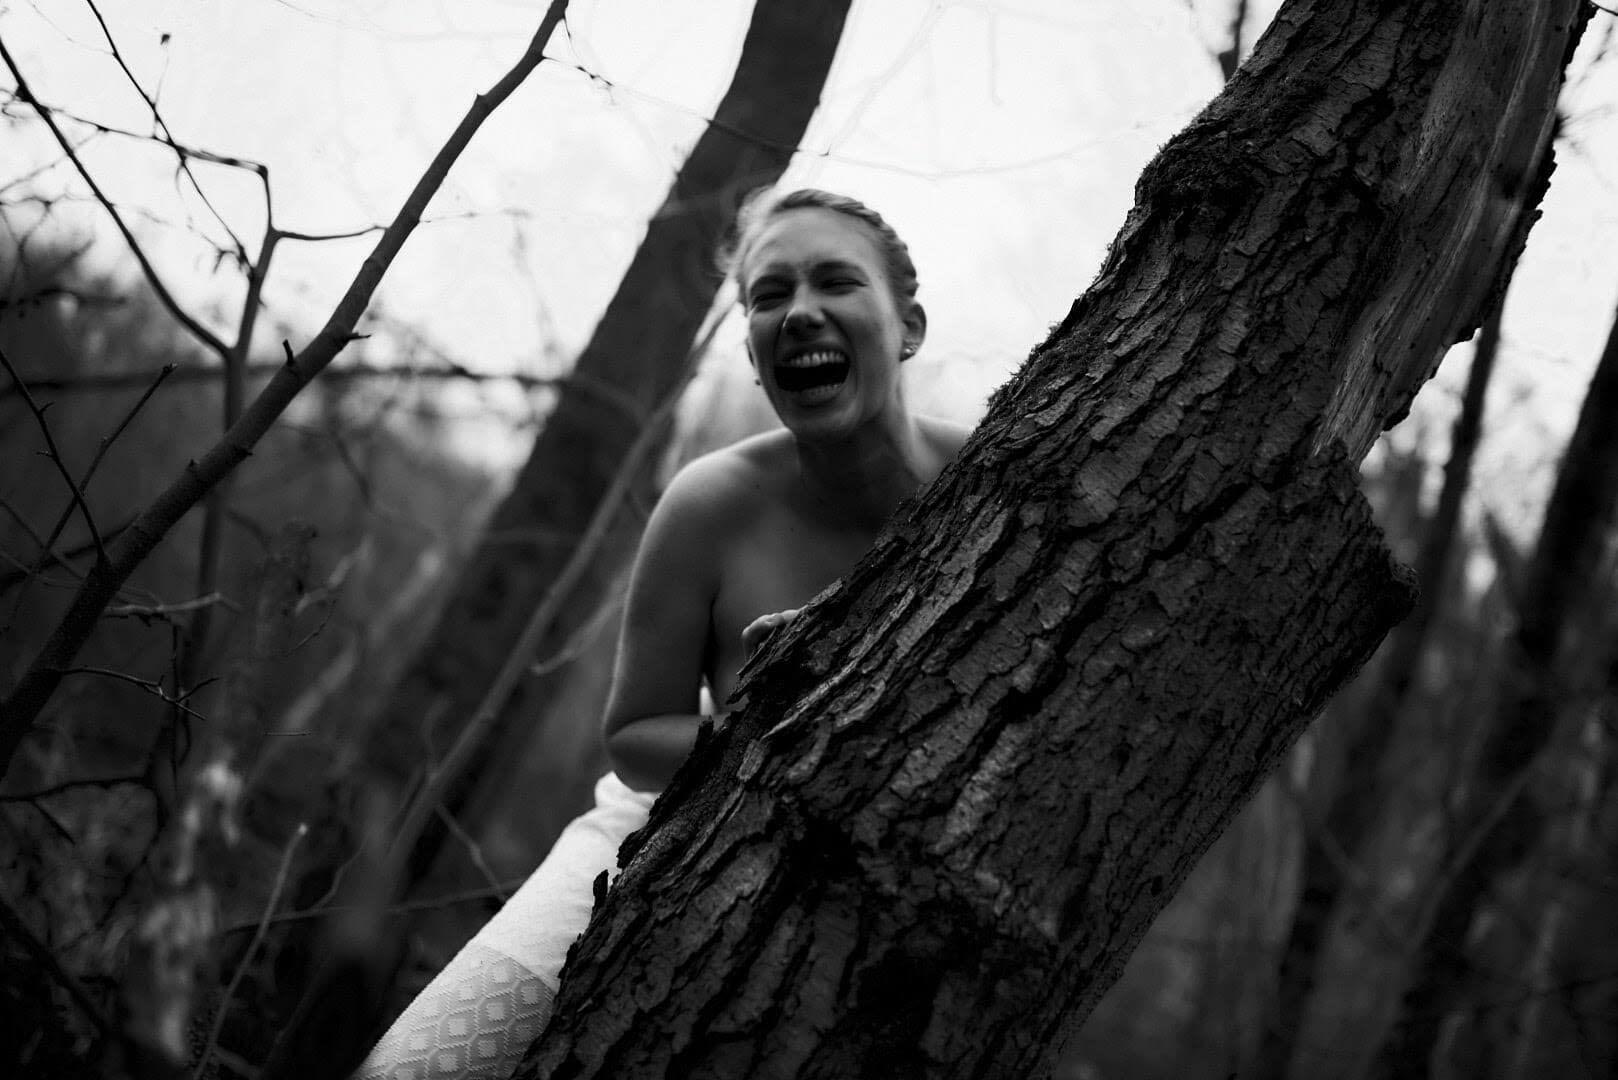 Fine-art Nude, Aktfotografie | Lost in the Swamp 5